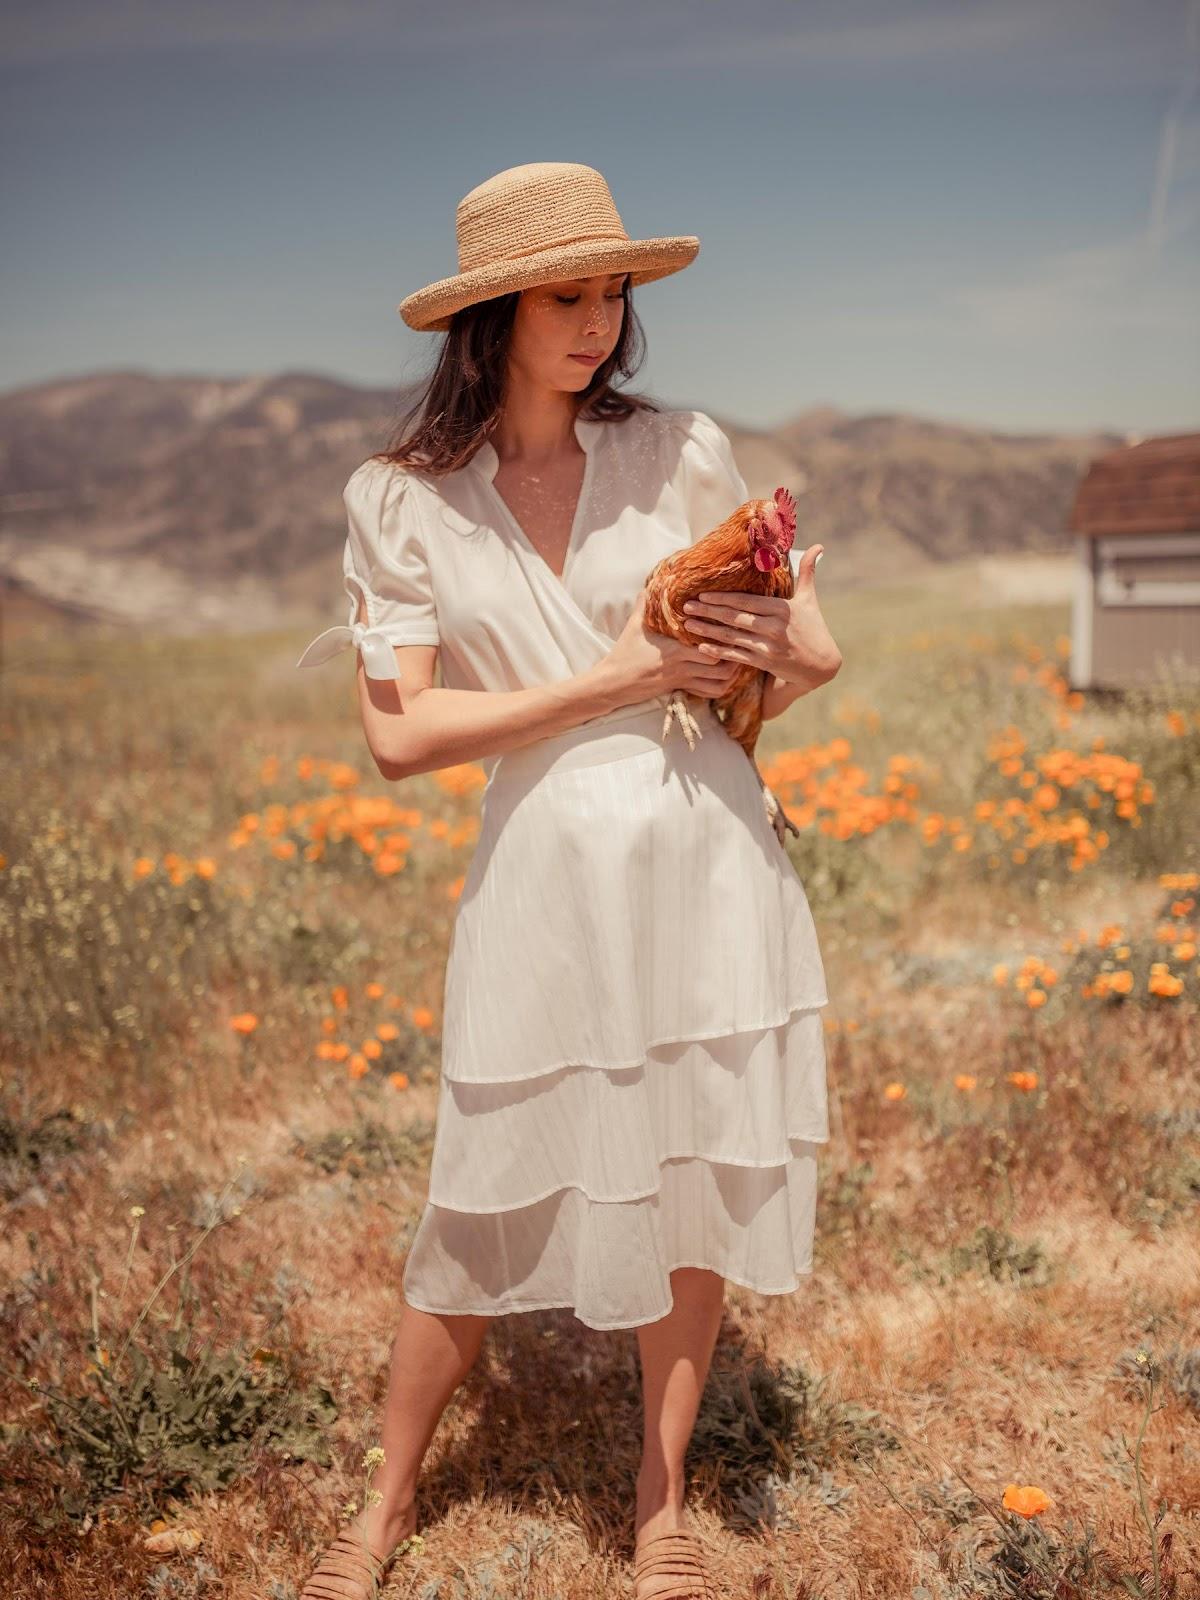 Beautiful white skirt from Valani made with vegan eco-friendly banana fabric